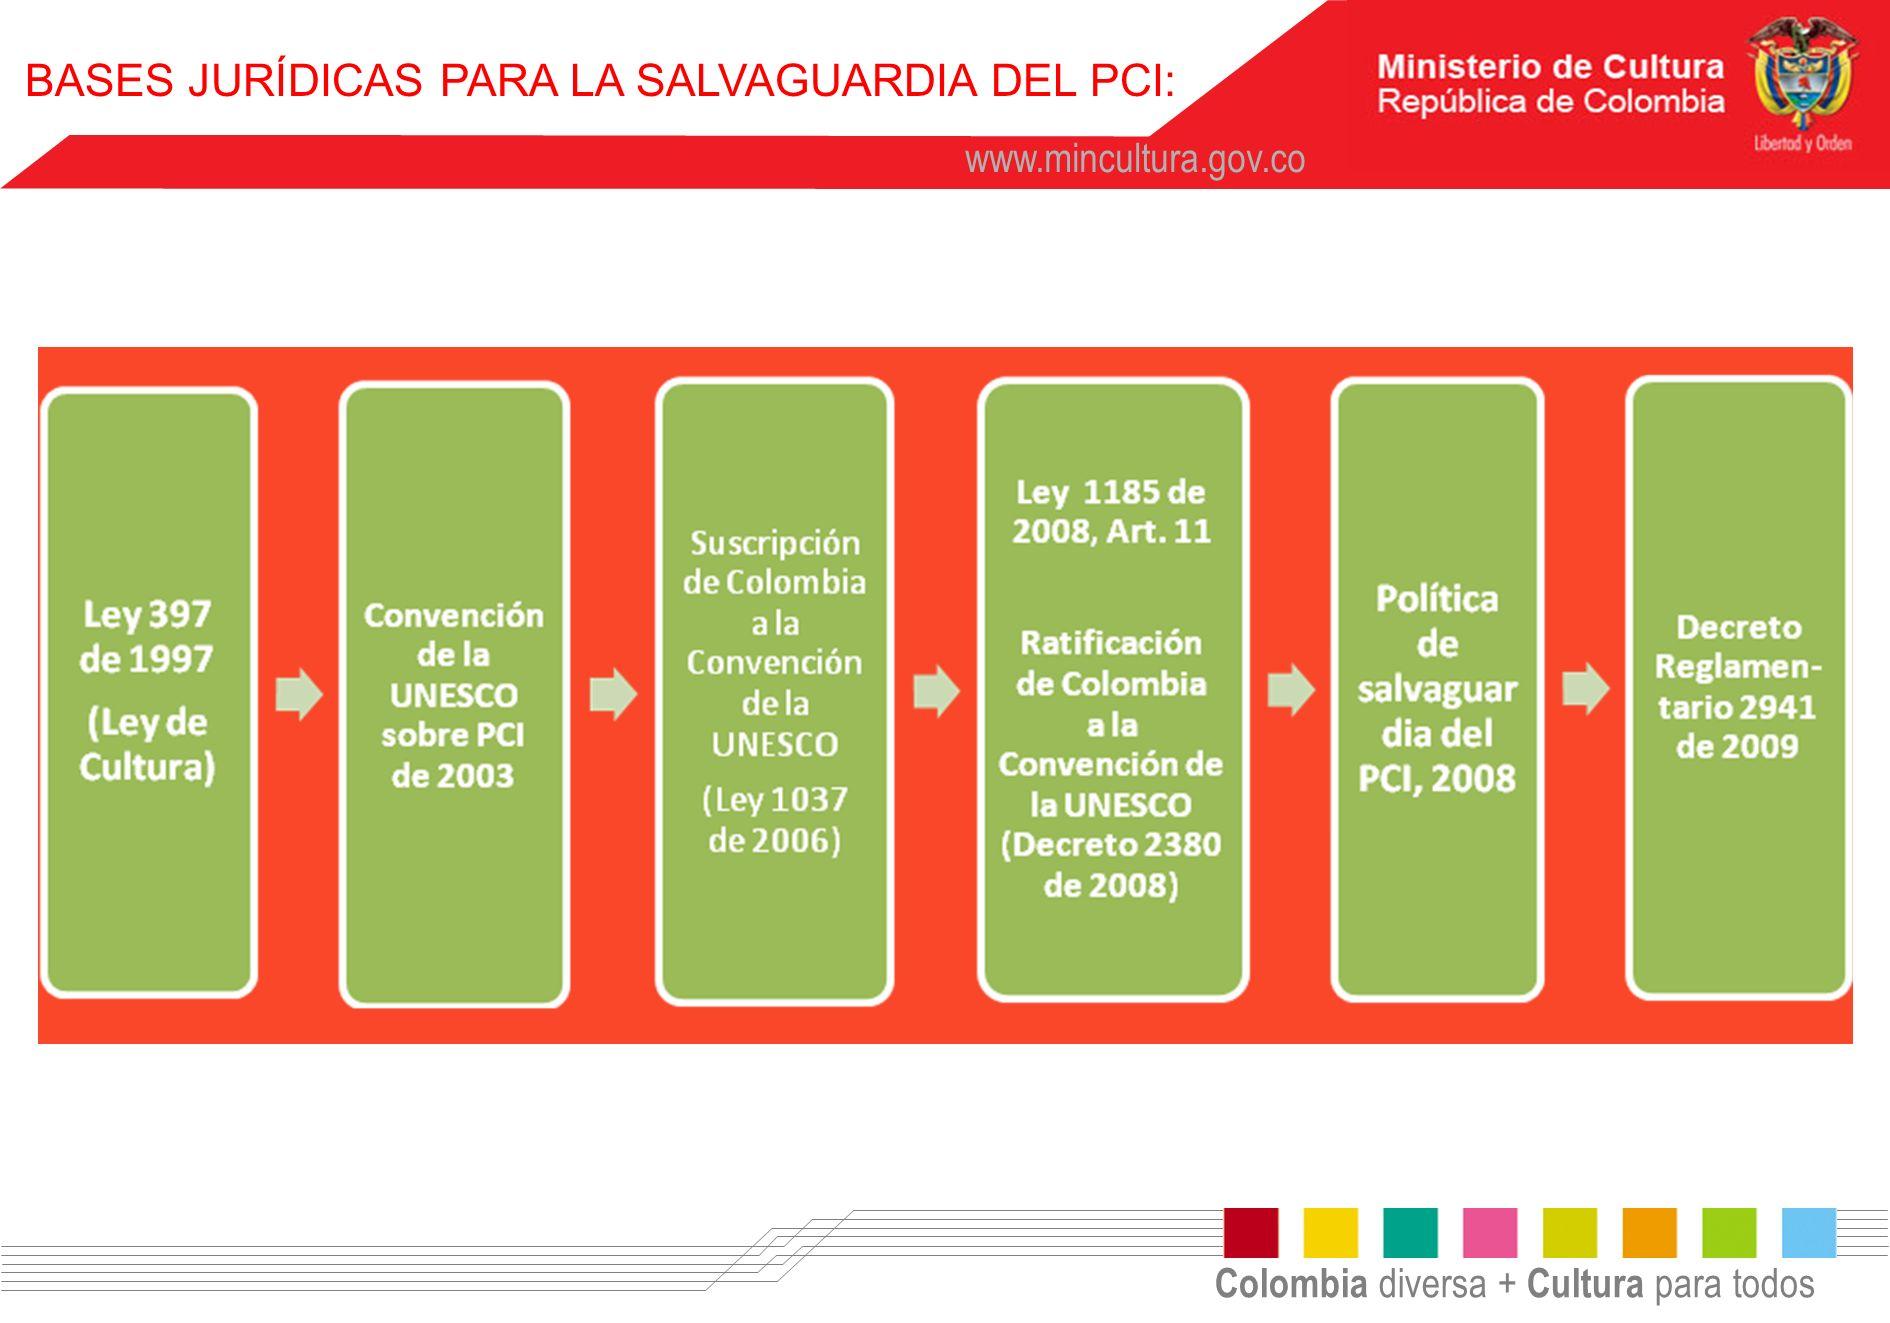 Colombia diversa + Cultura para todos www.mincultura.gov.co BASES JURÍDICAS PARA LA SALVAGUARDIA DEL PCI: